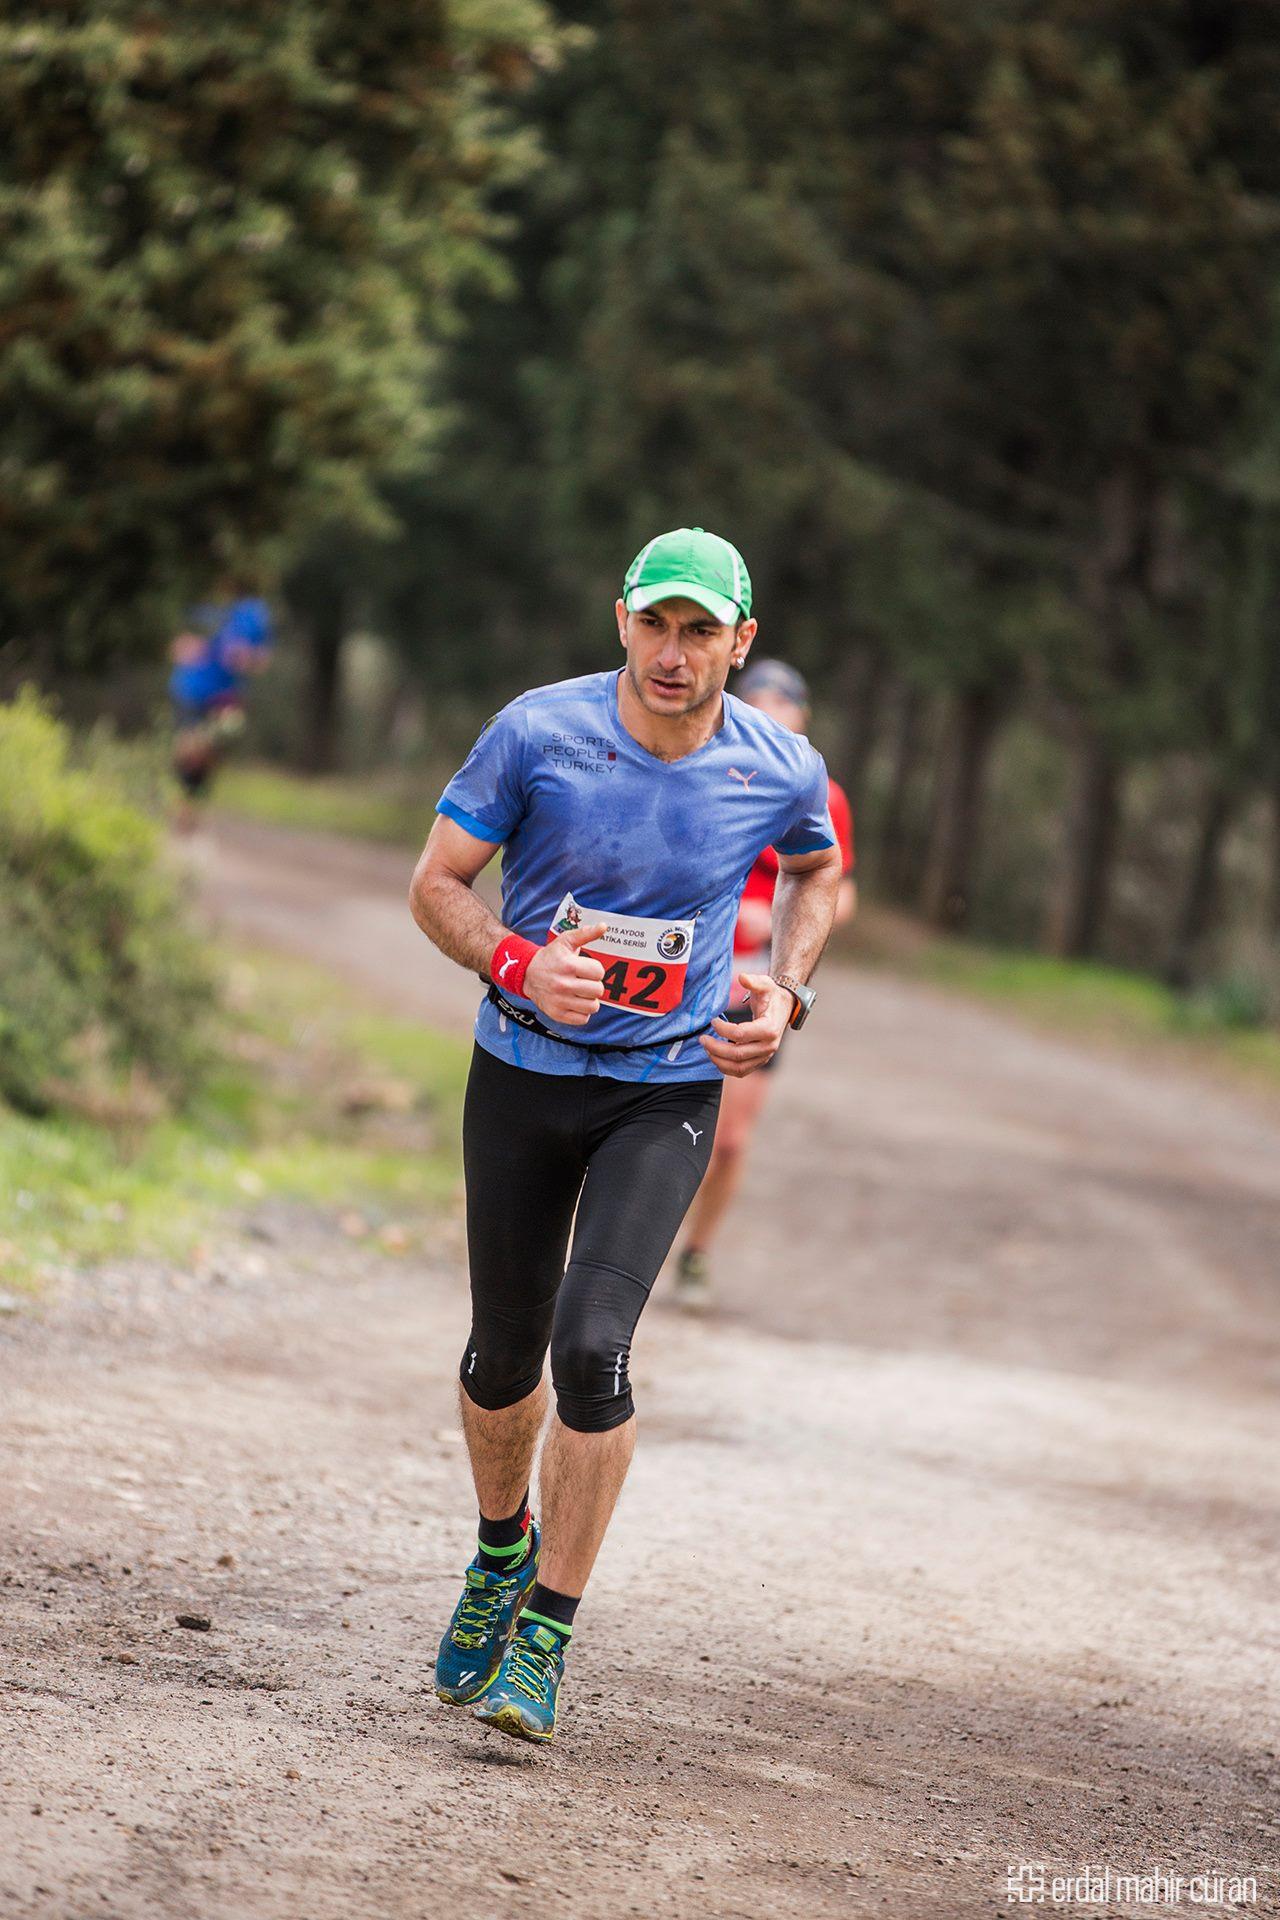 Gurkan Acikgoz - Istanbul, Turkey - Runner